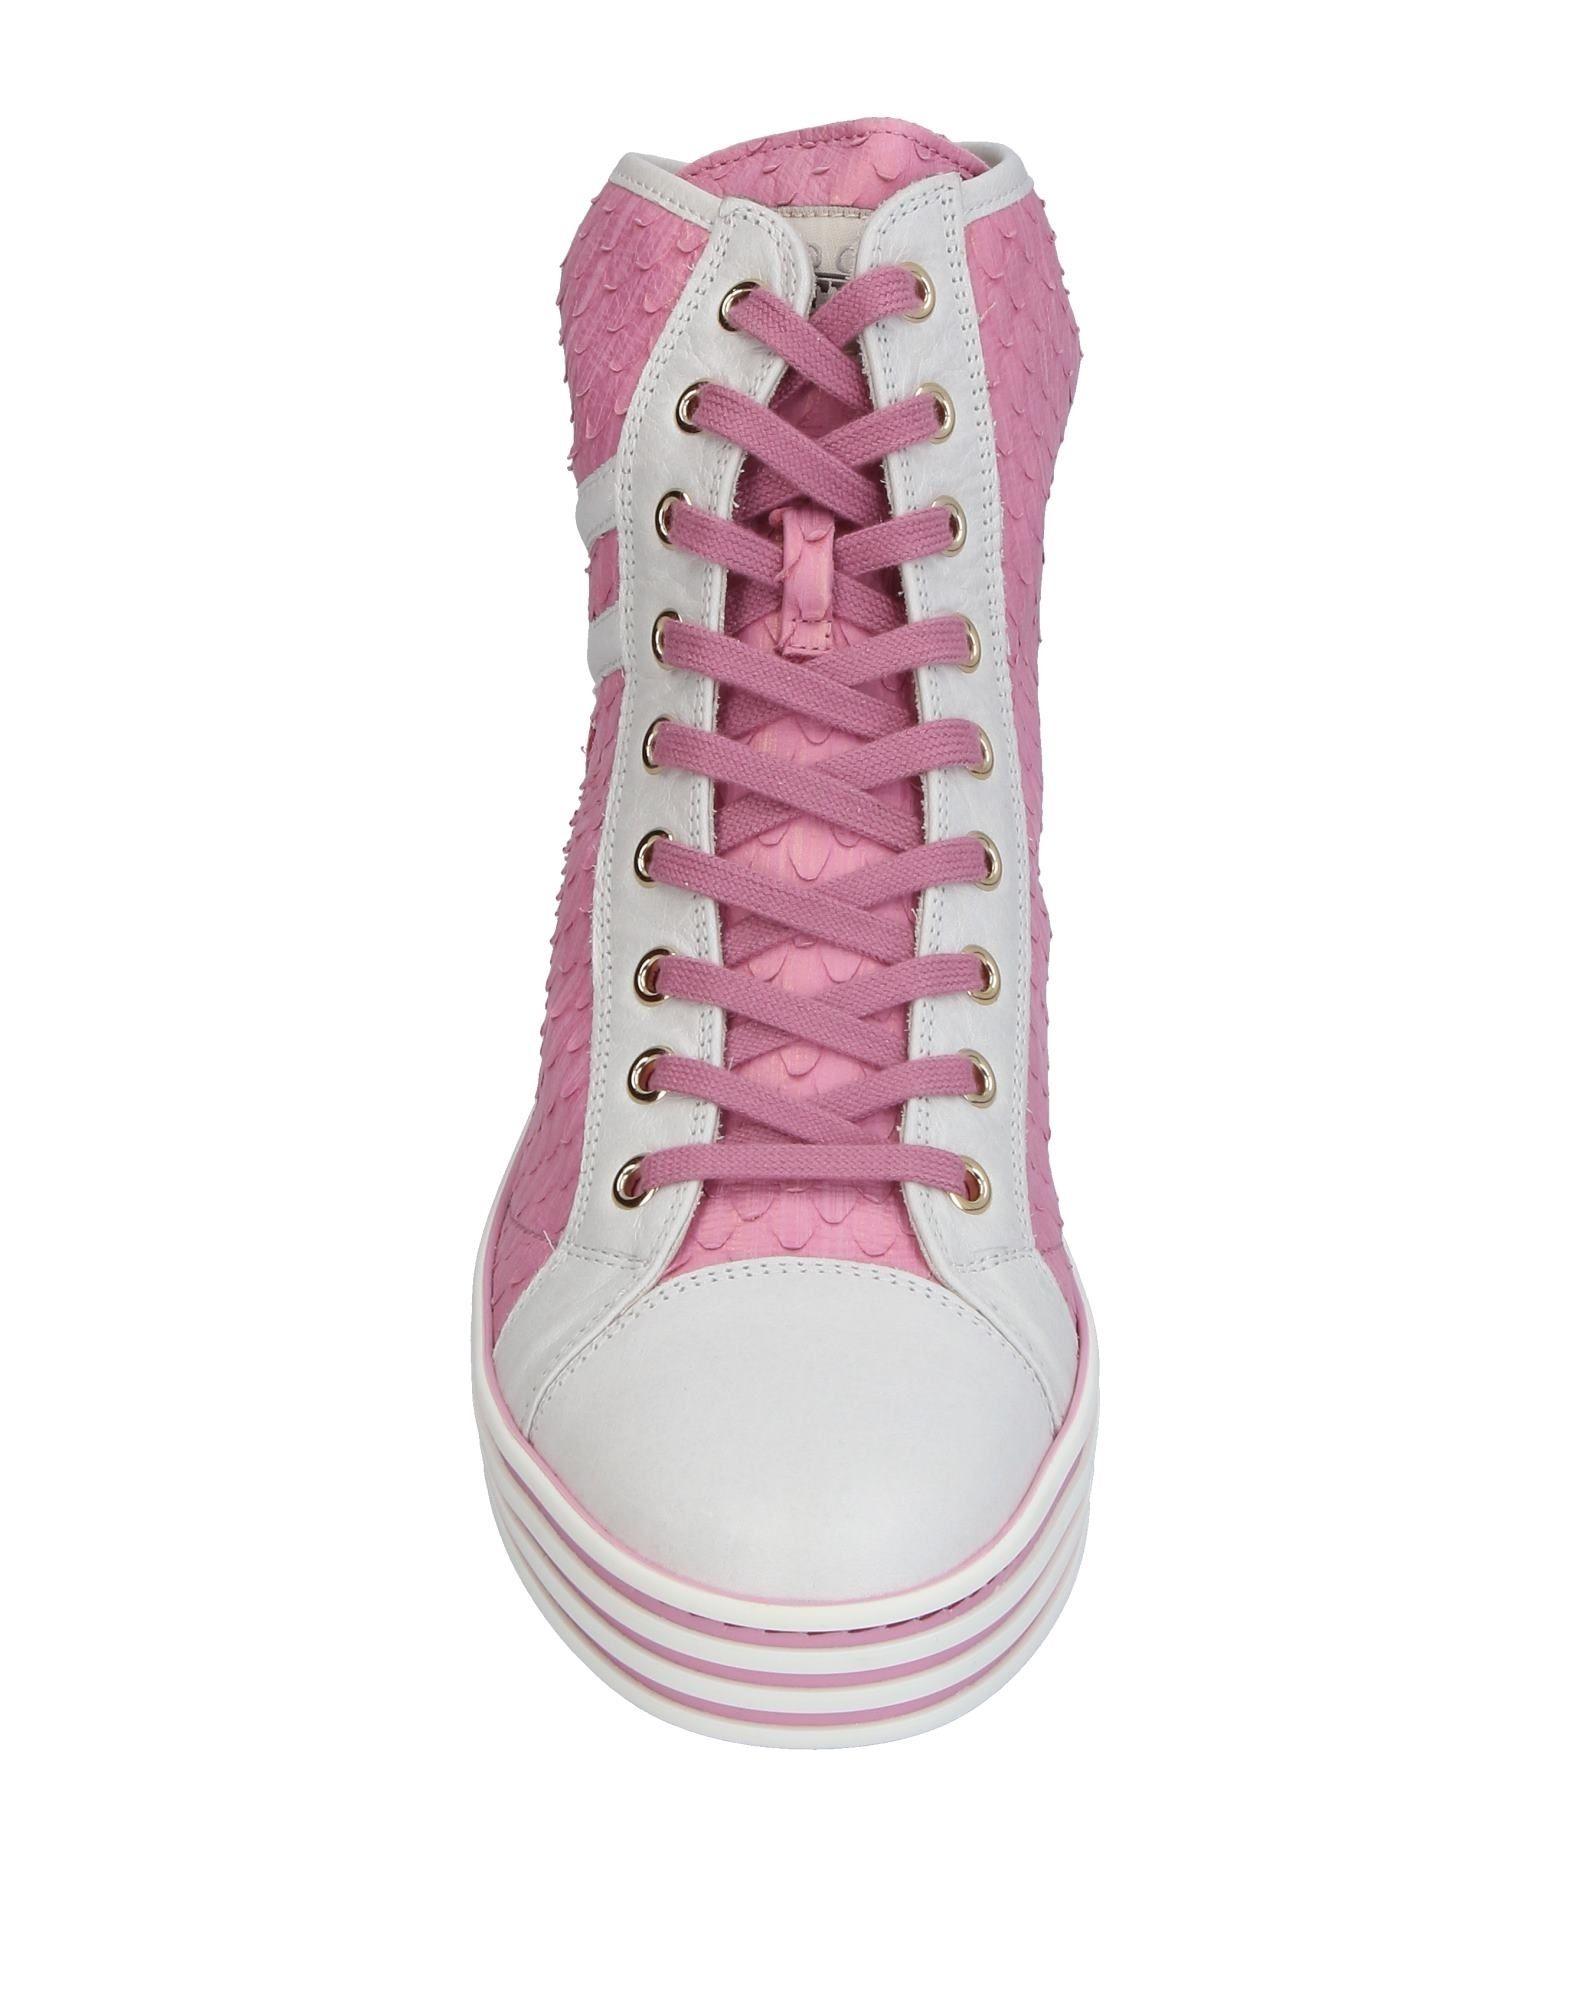 Hogan 11375899TLGut Rebel Sneakers Damen  11375899TLGut Hogan aussehende strapazierfähige Schuhe c4503a